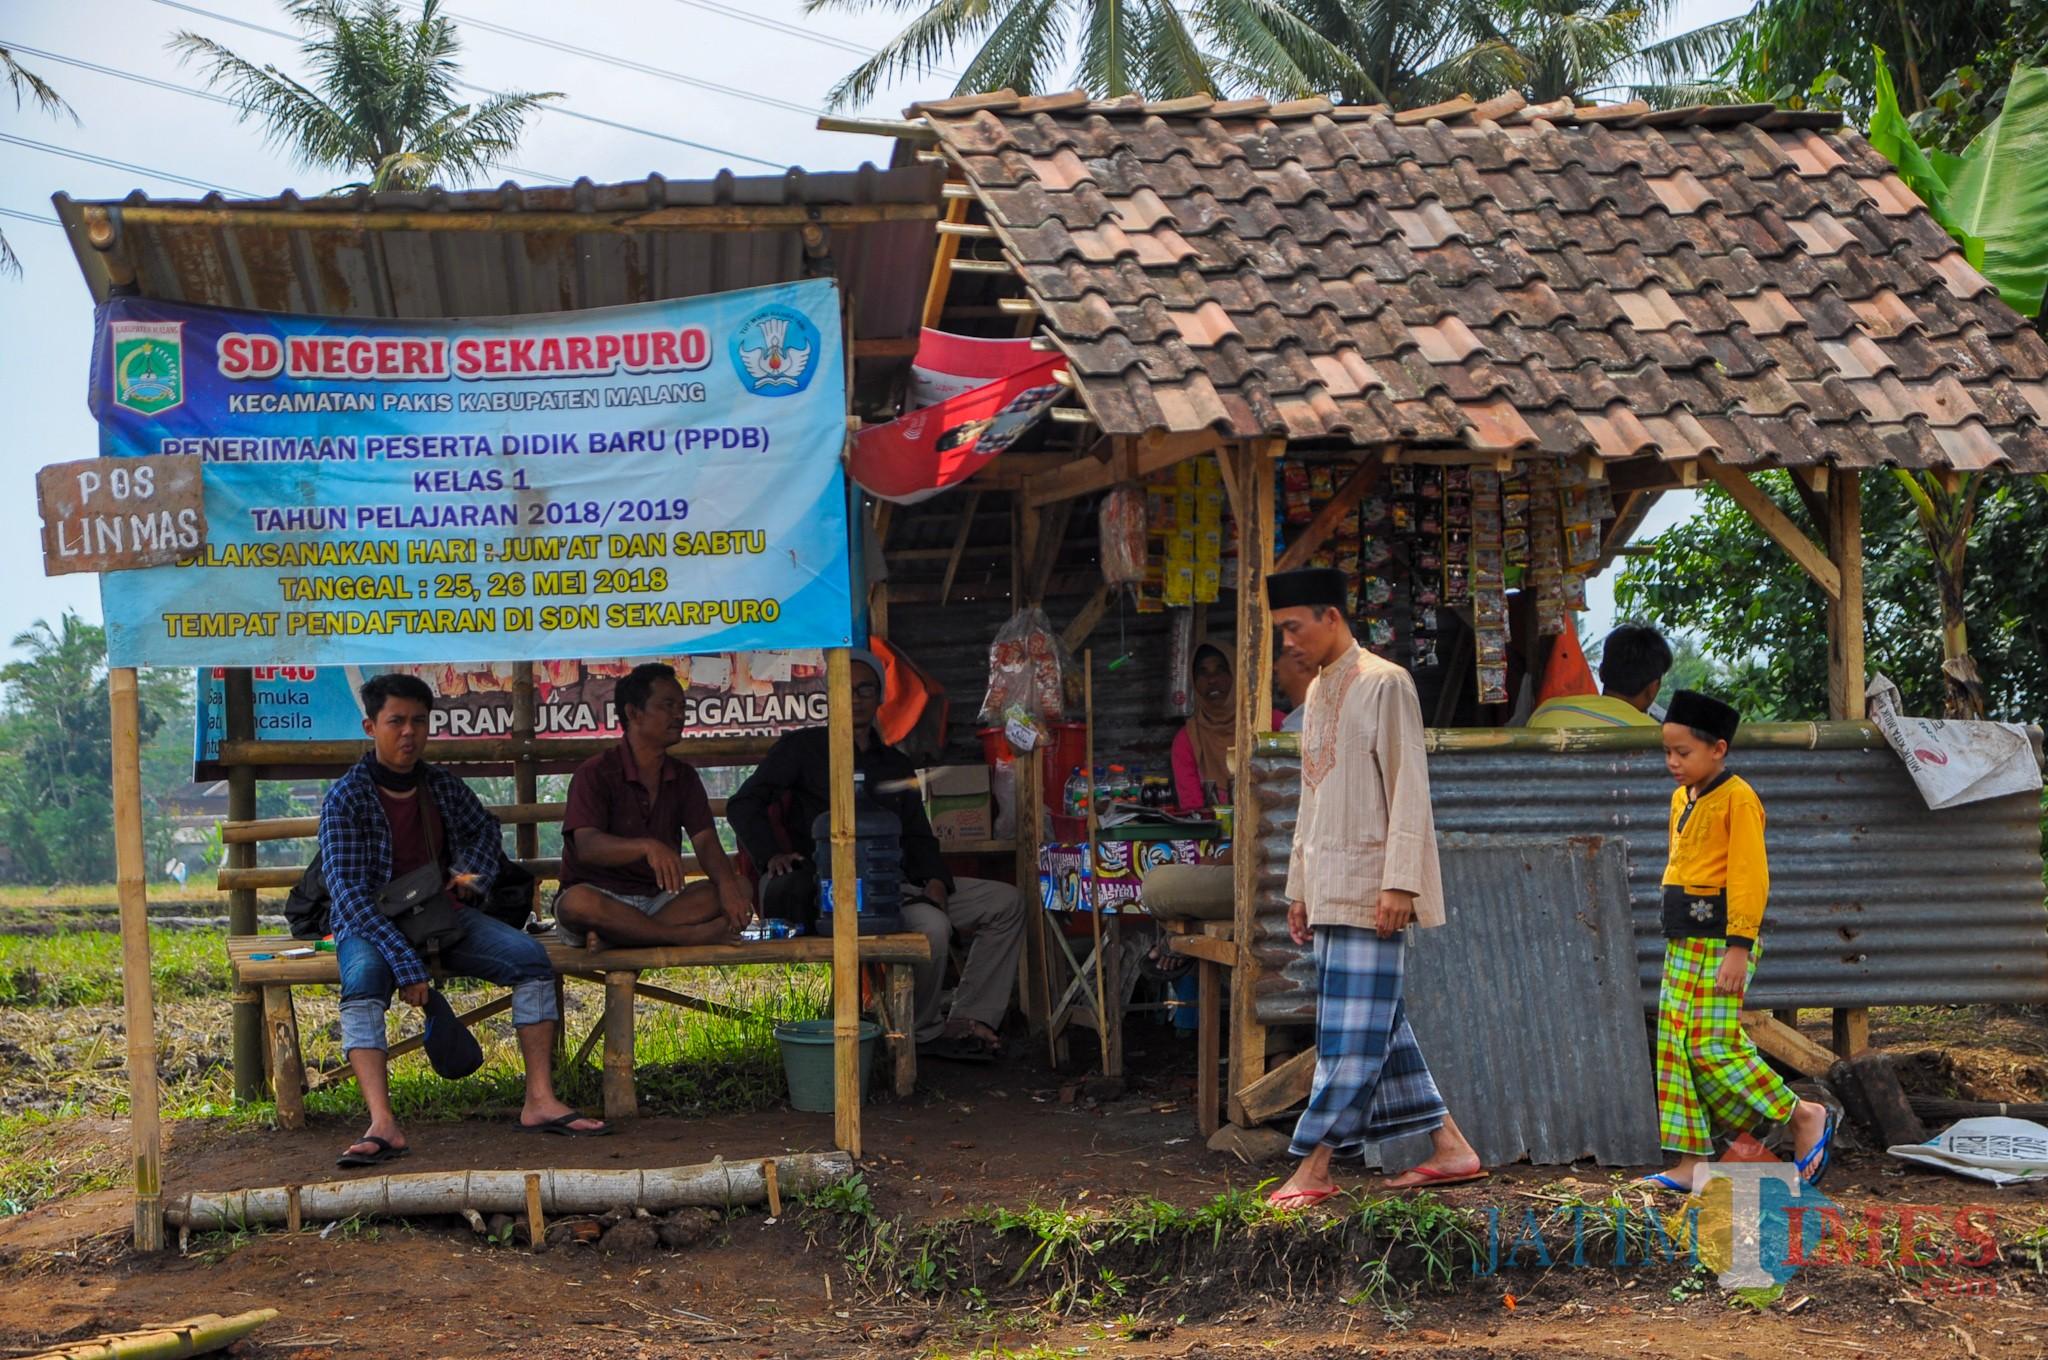 Warung milik Lianah warga dusun sekaran yang berlokasi di luar area situs Sekaran (Luqmanul Hakim/Malang Times)